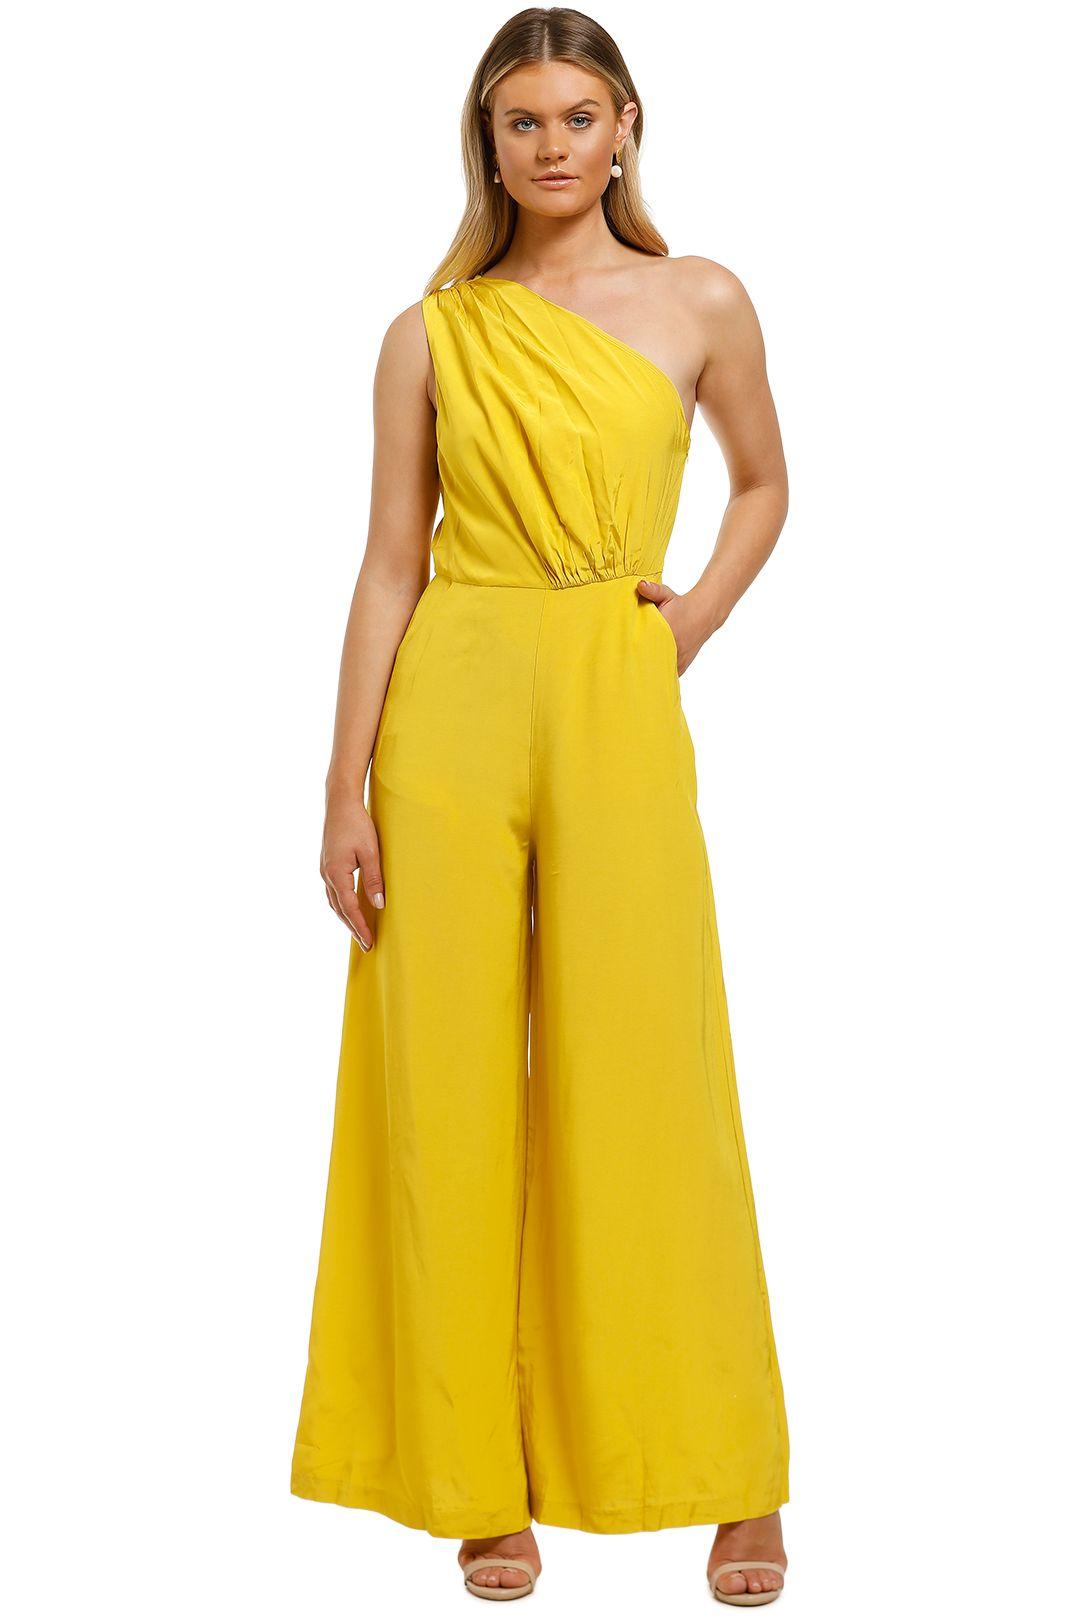 Vestire-Pretty-Hurts-Jumpsuit-Mustard-Front